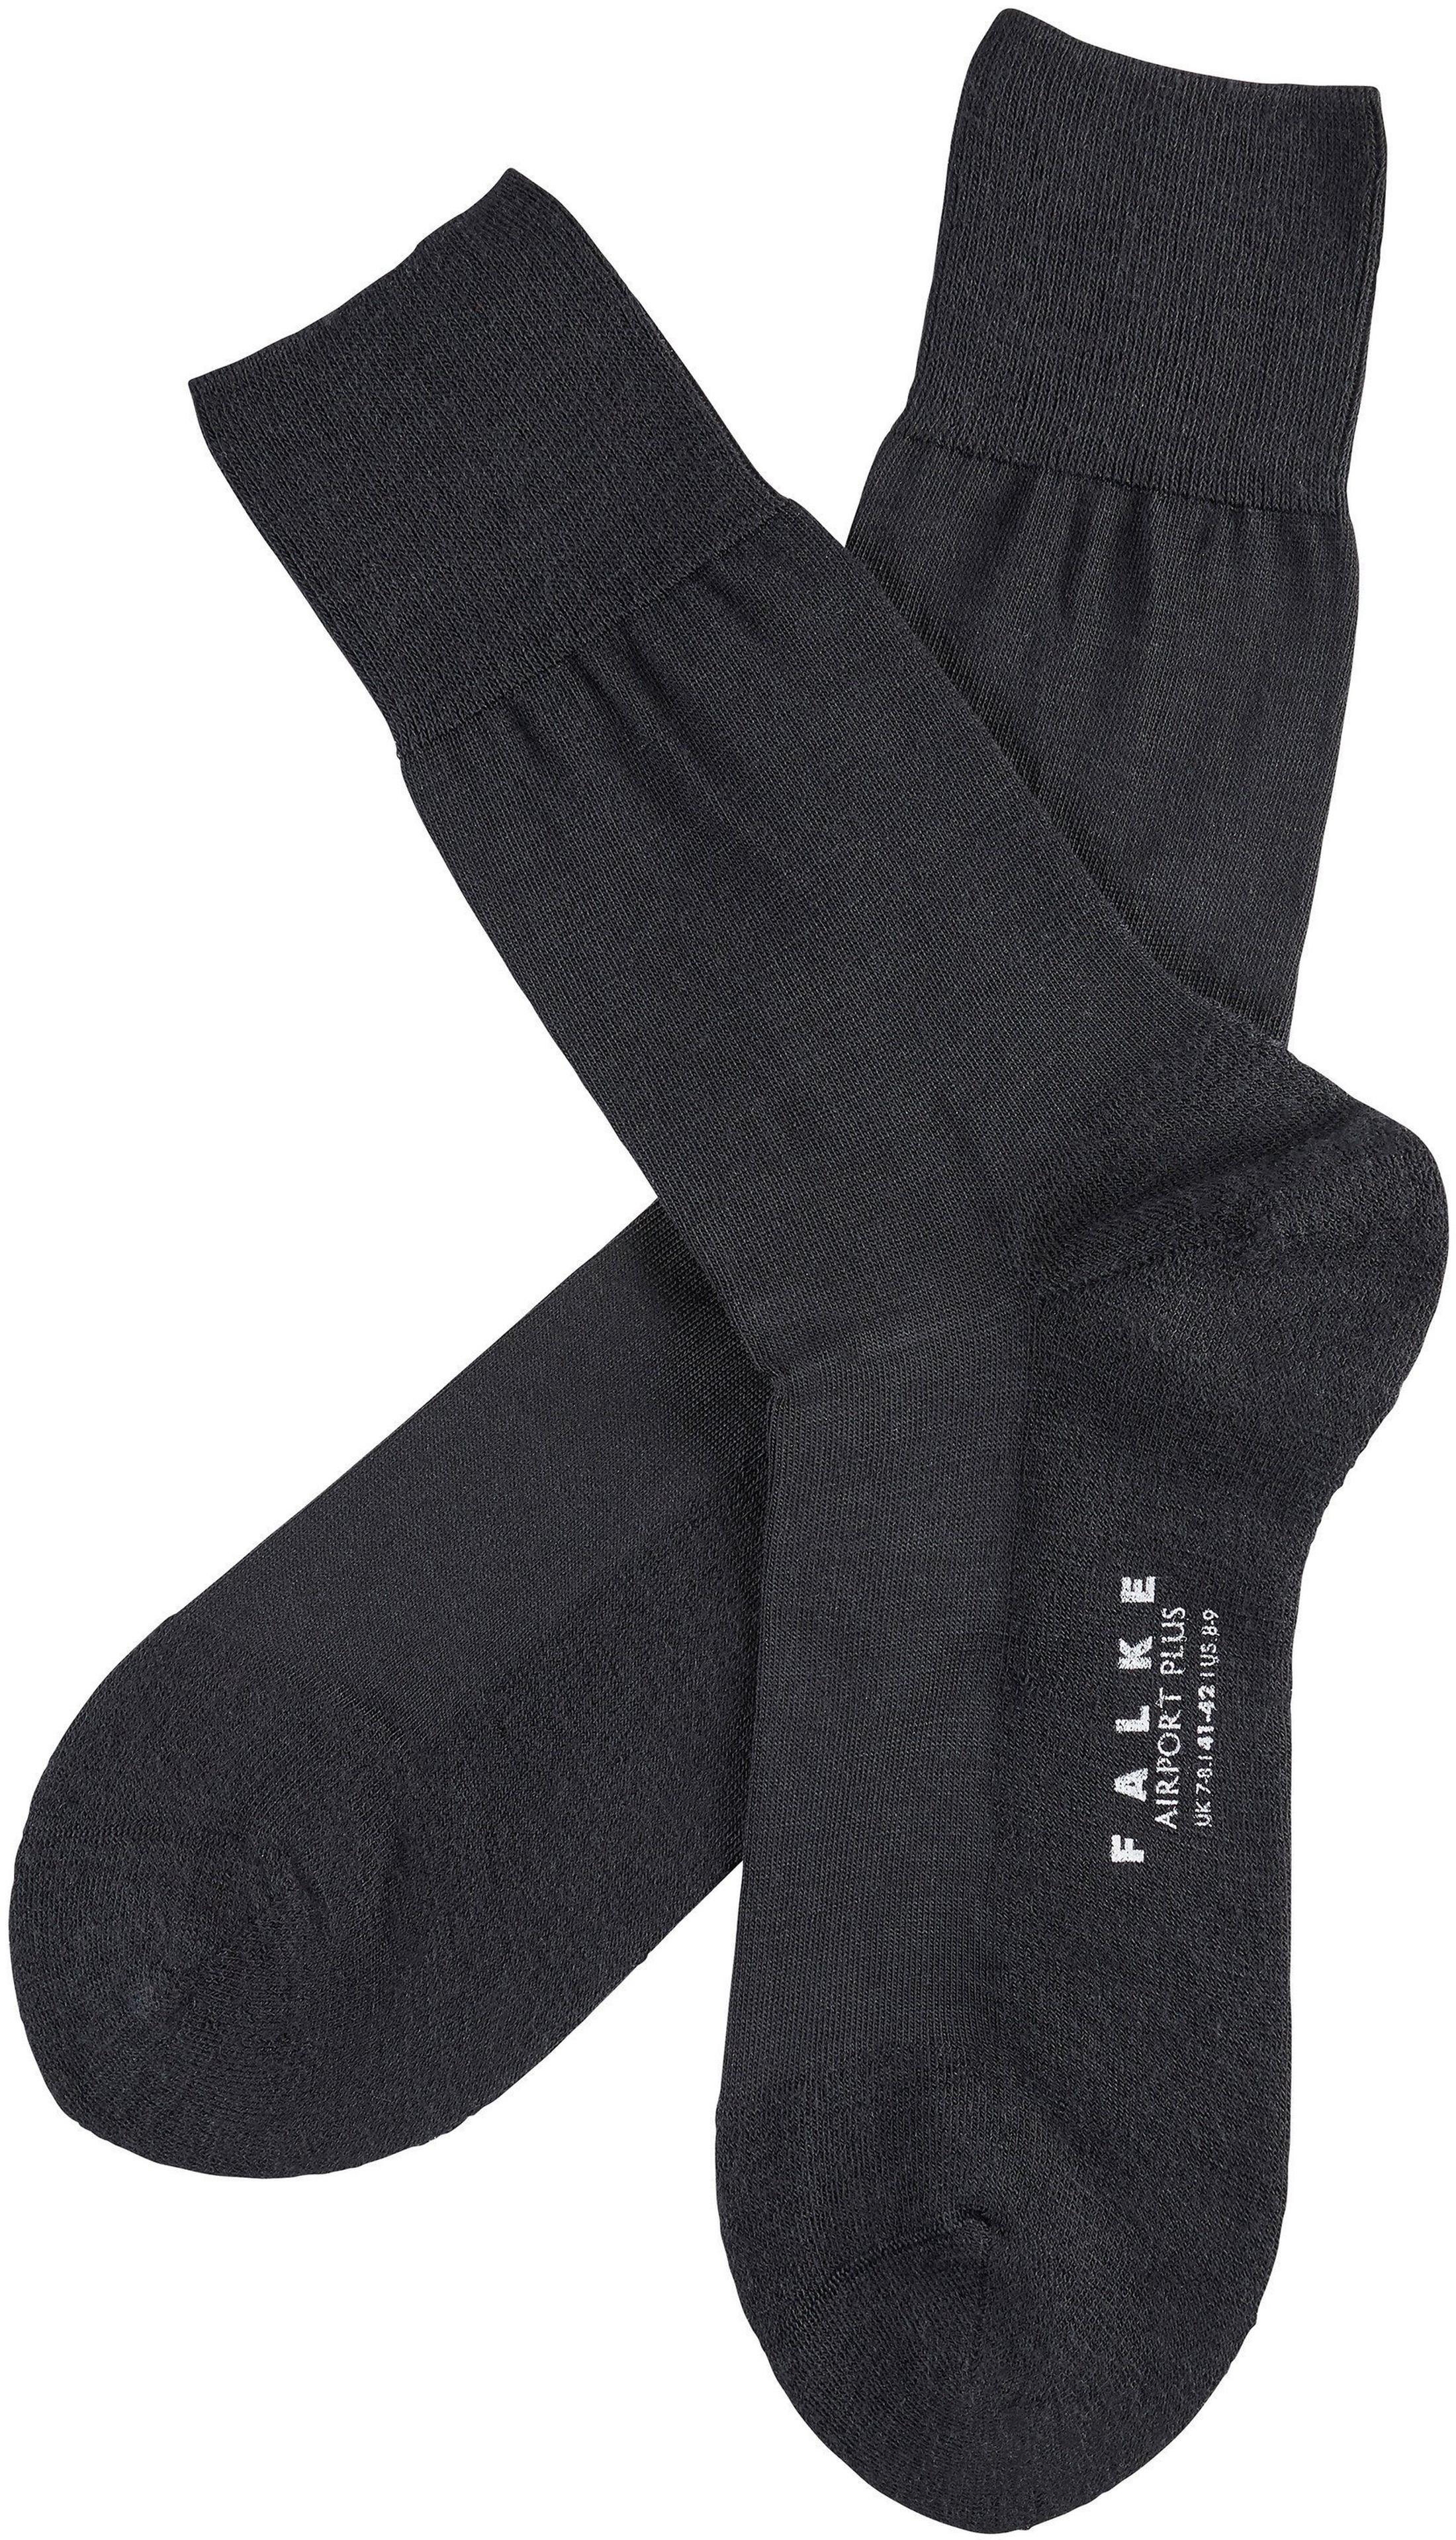 Falke Airport PLUS Socks Black 3000